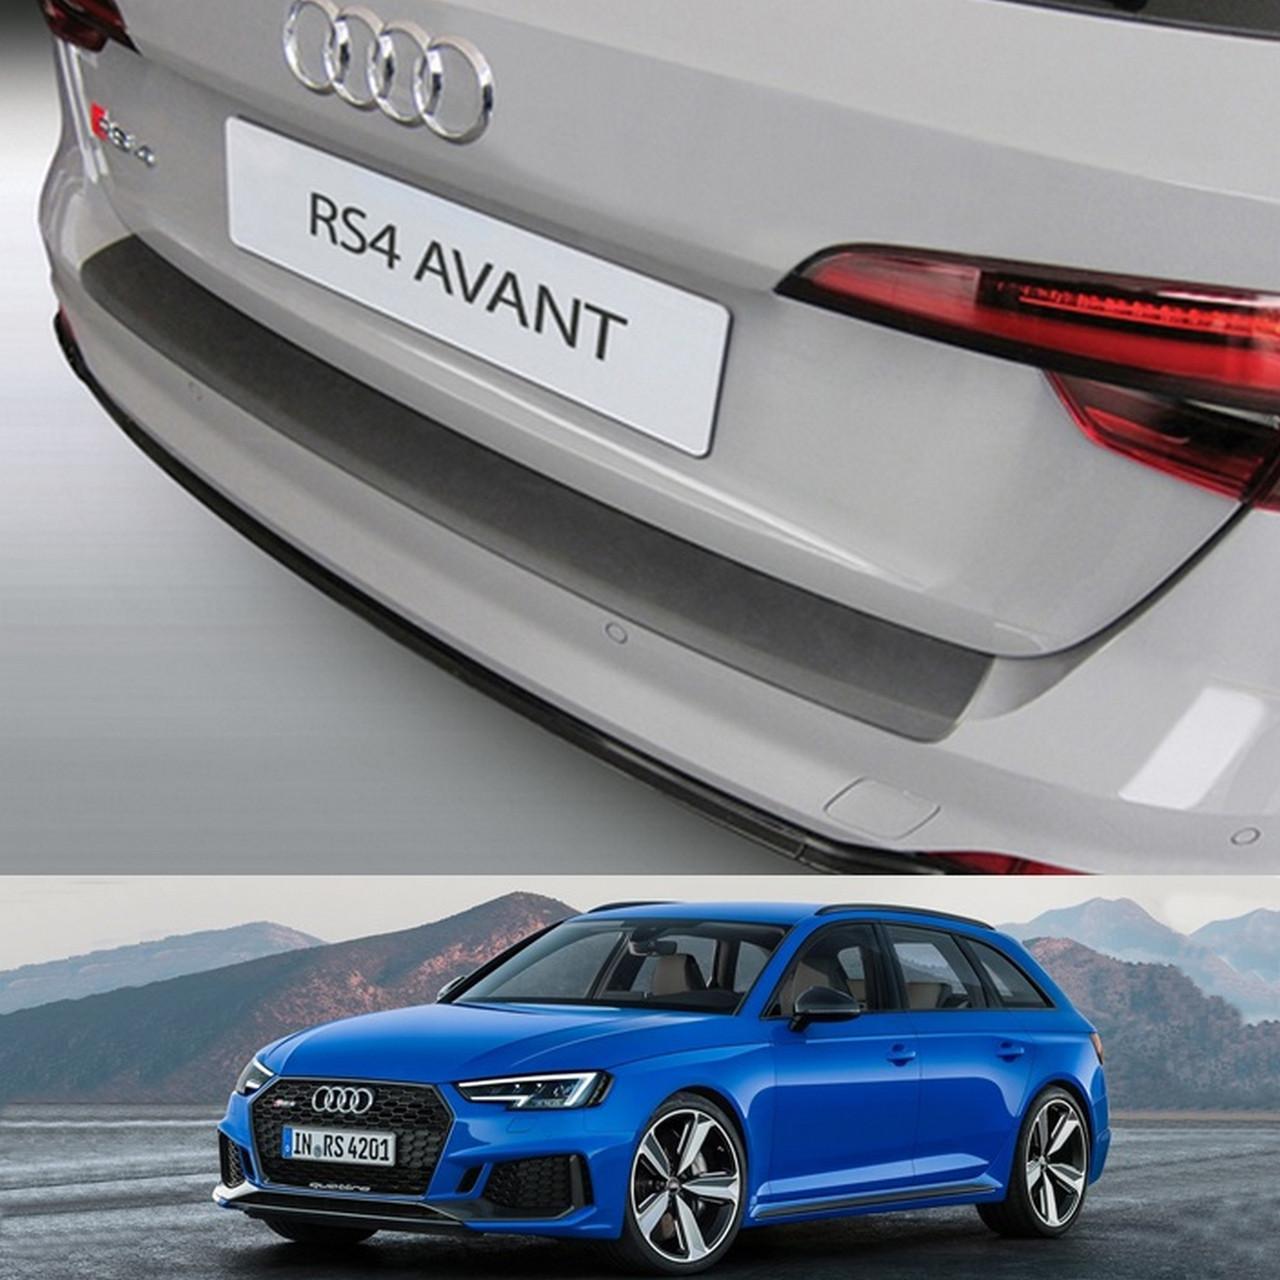 Пластикова захисна накладка на задній бампер для  Audi RS4 Avant 2018-2020